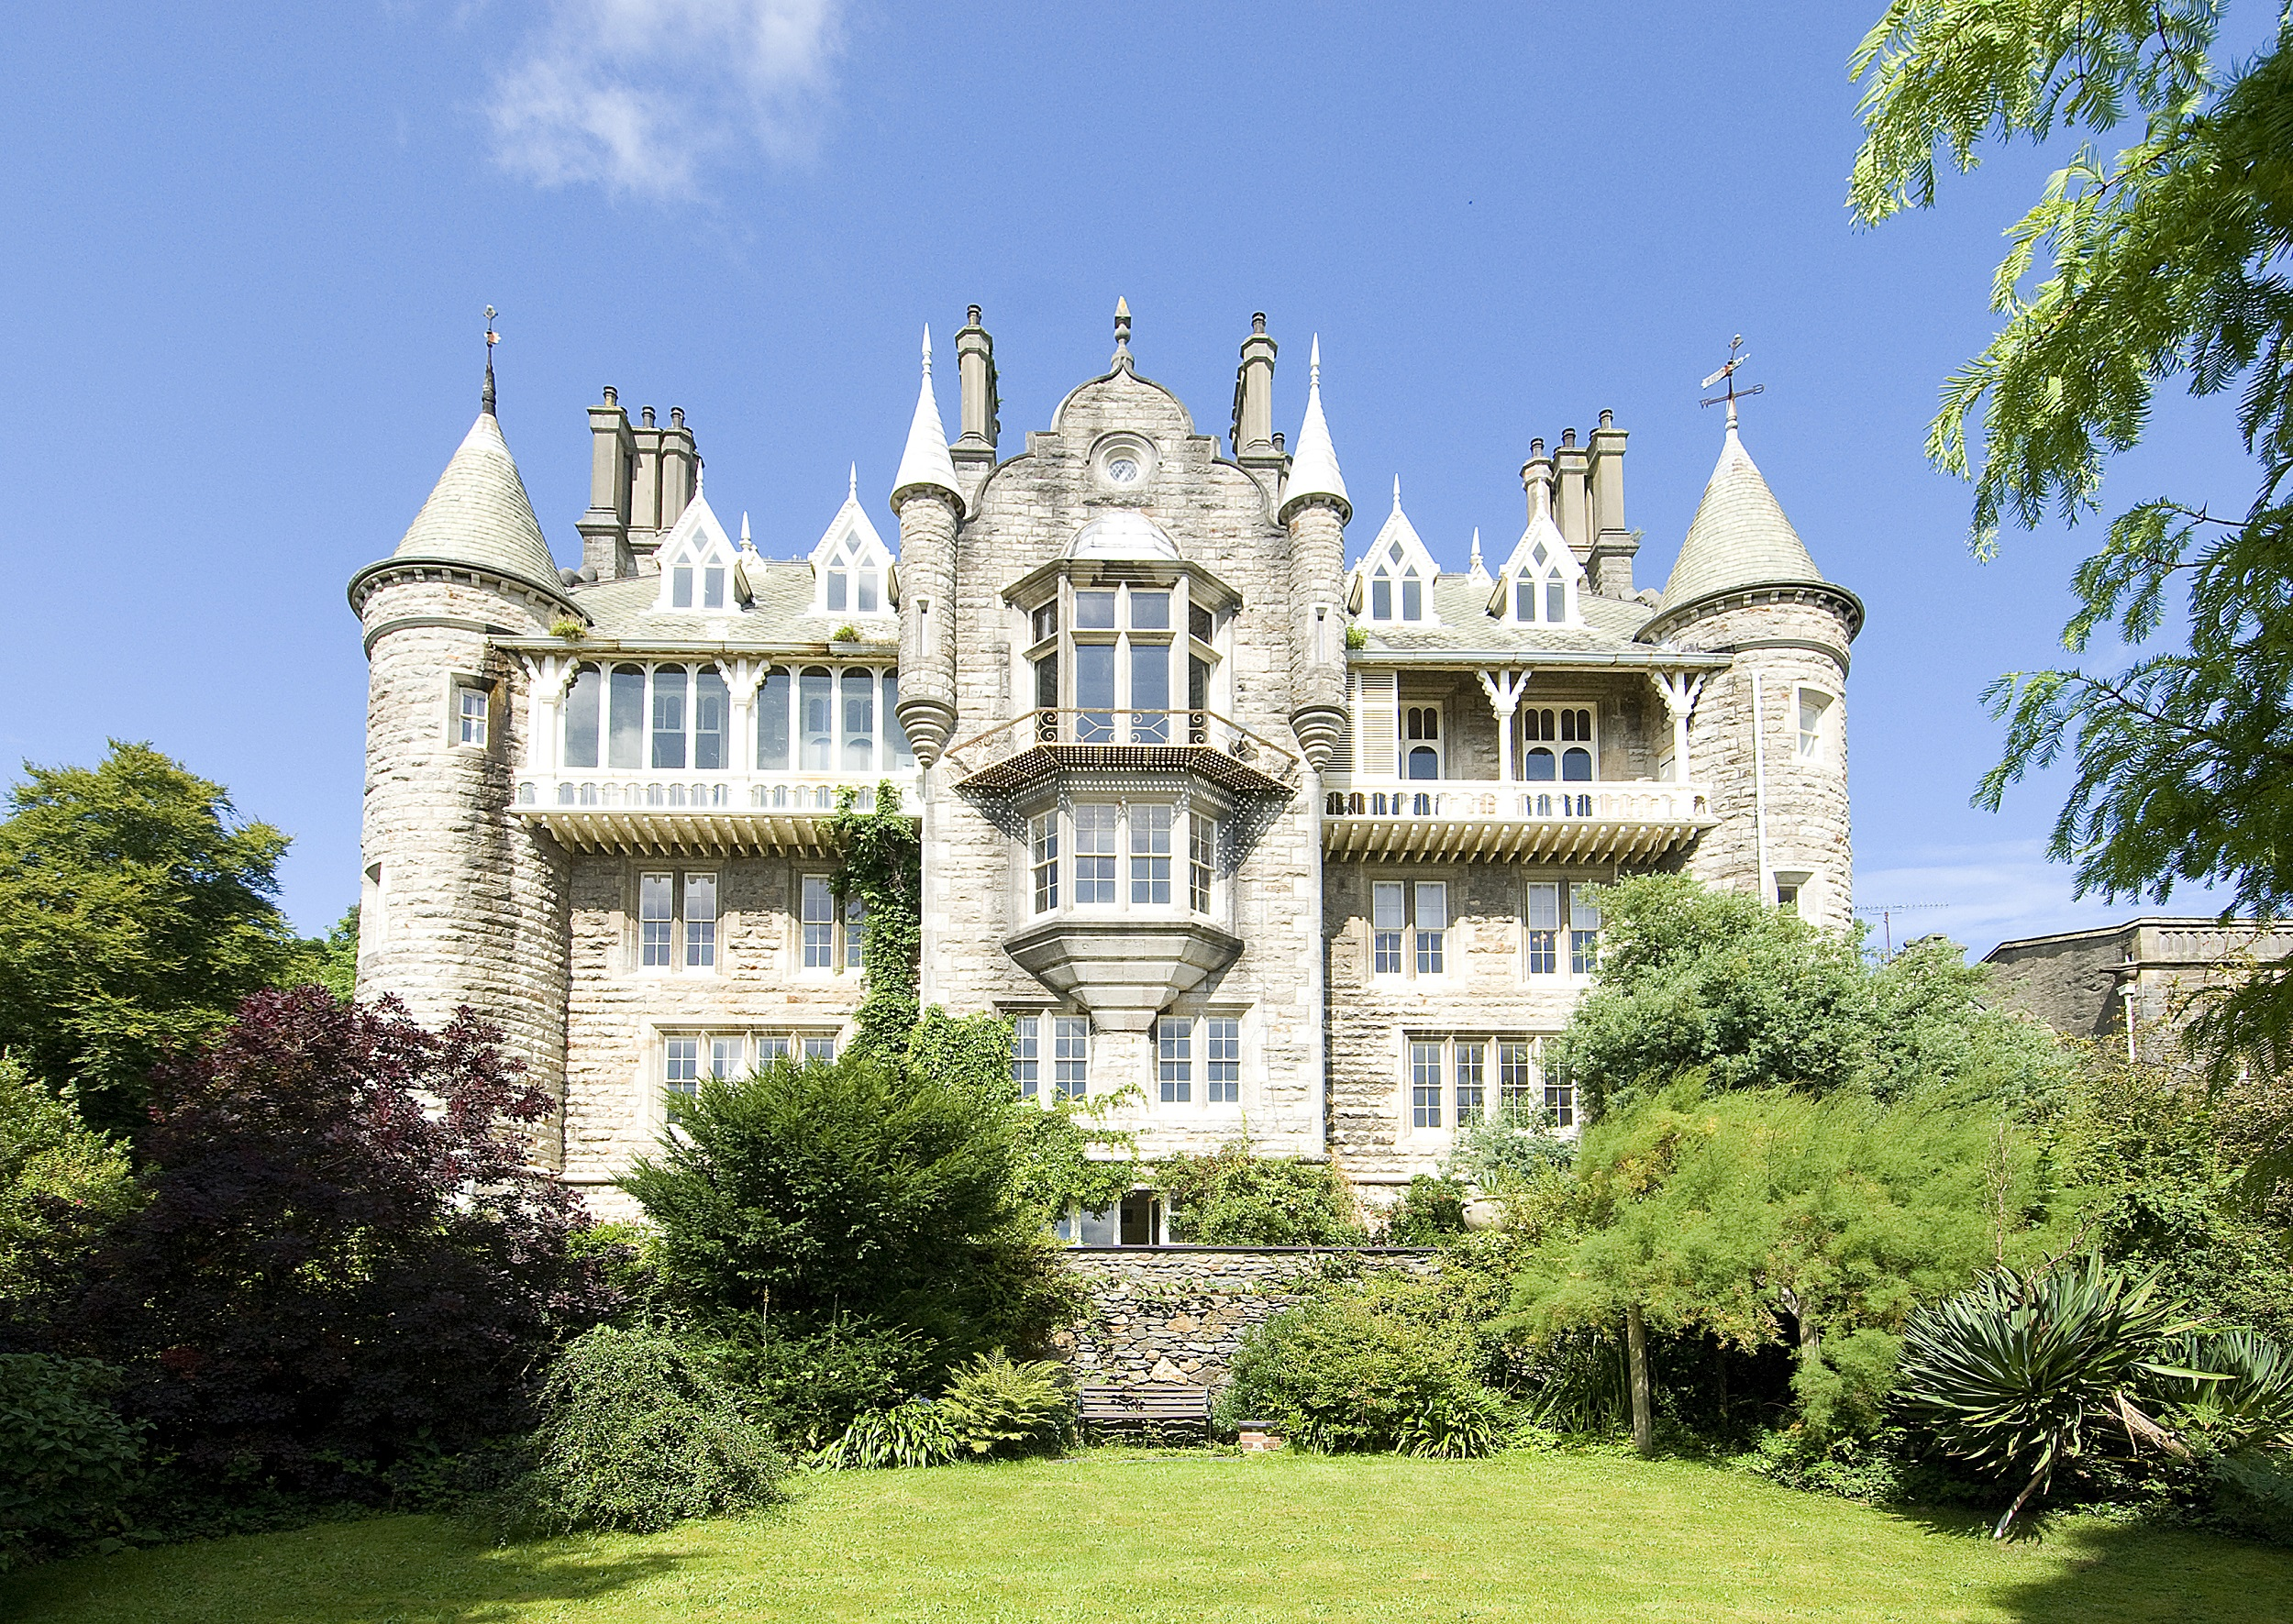 Chateau Rhianfa Venue Hire, LL5